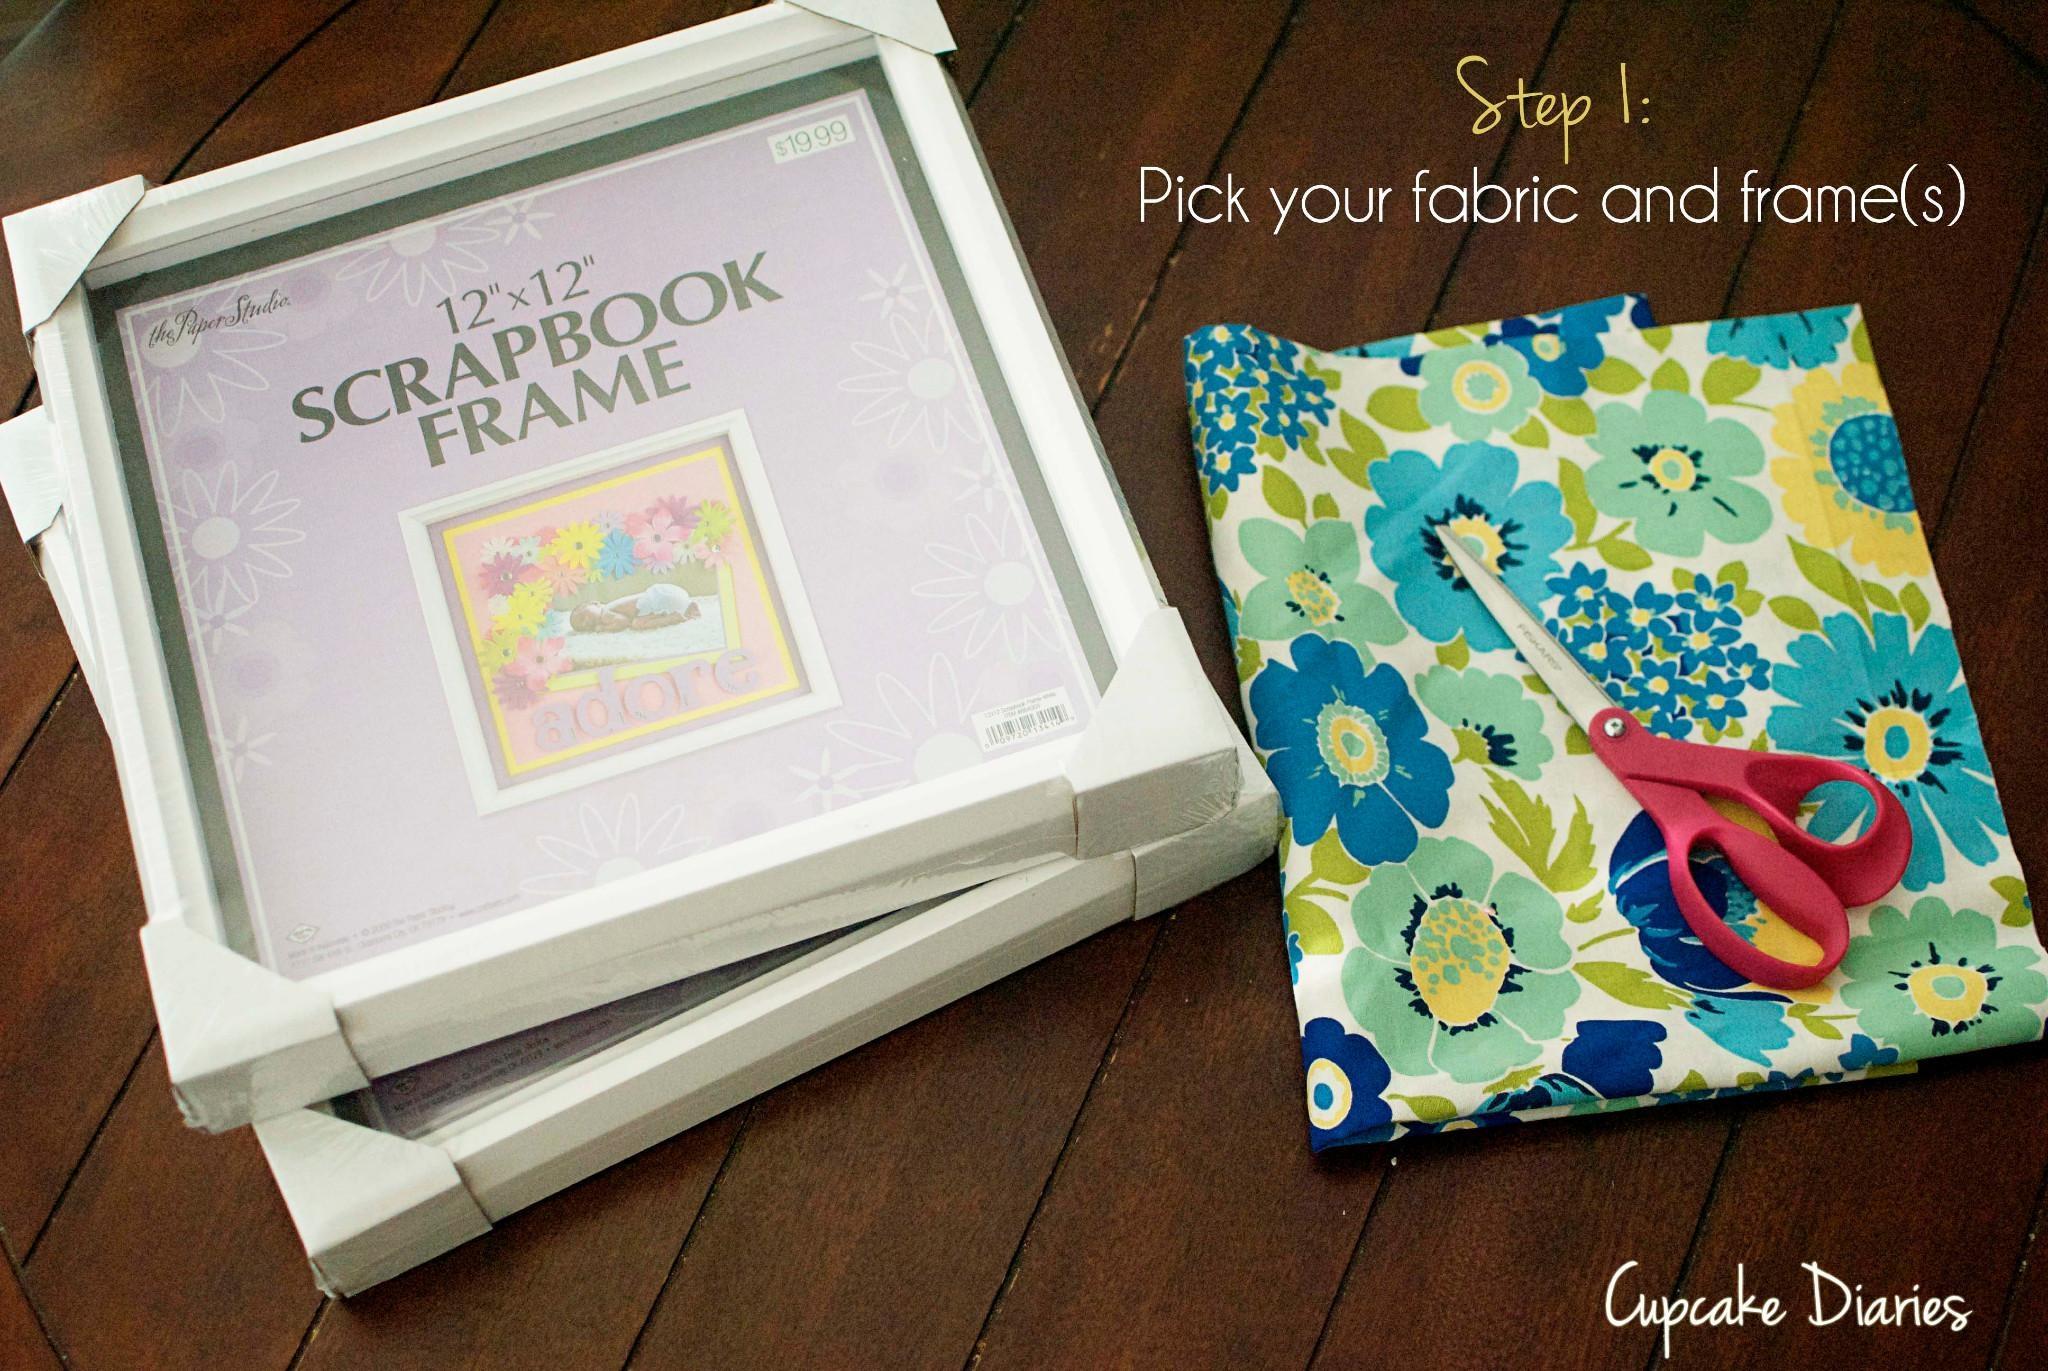 Diy Fabric Wall Art – Cupcake Diaries For Fabric Wall Art (Image 7 of 20)